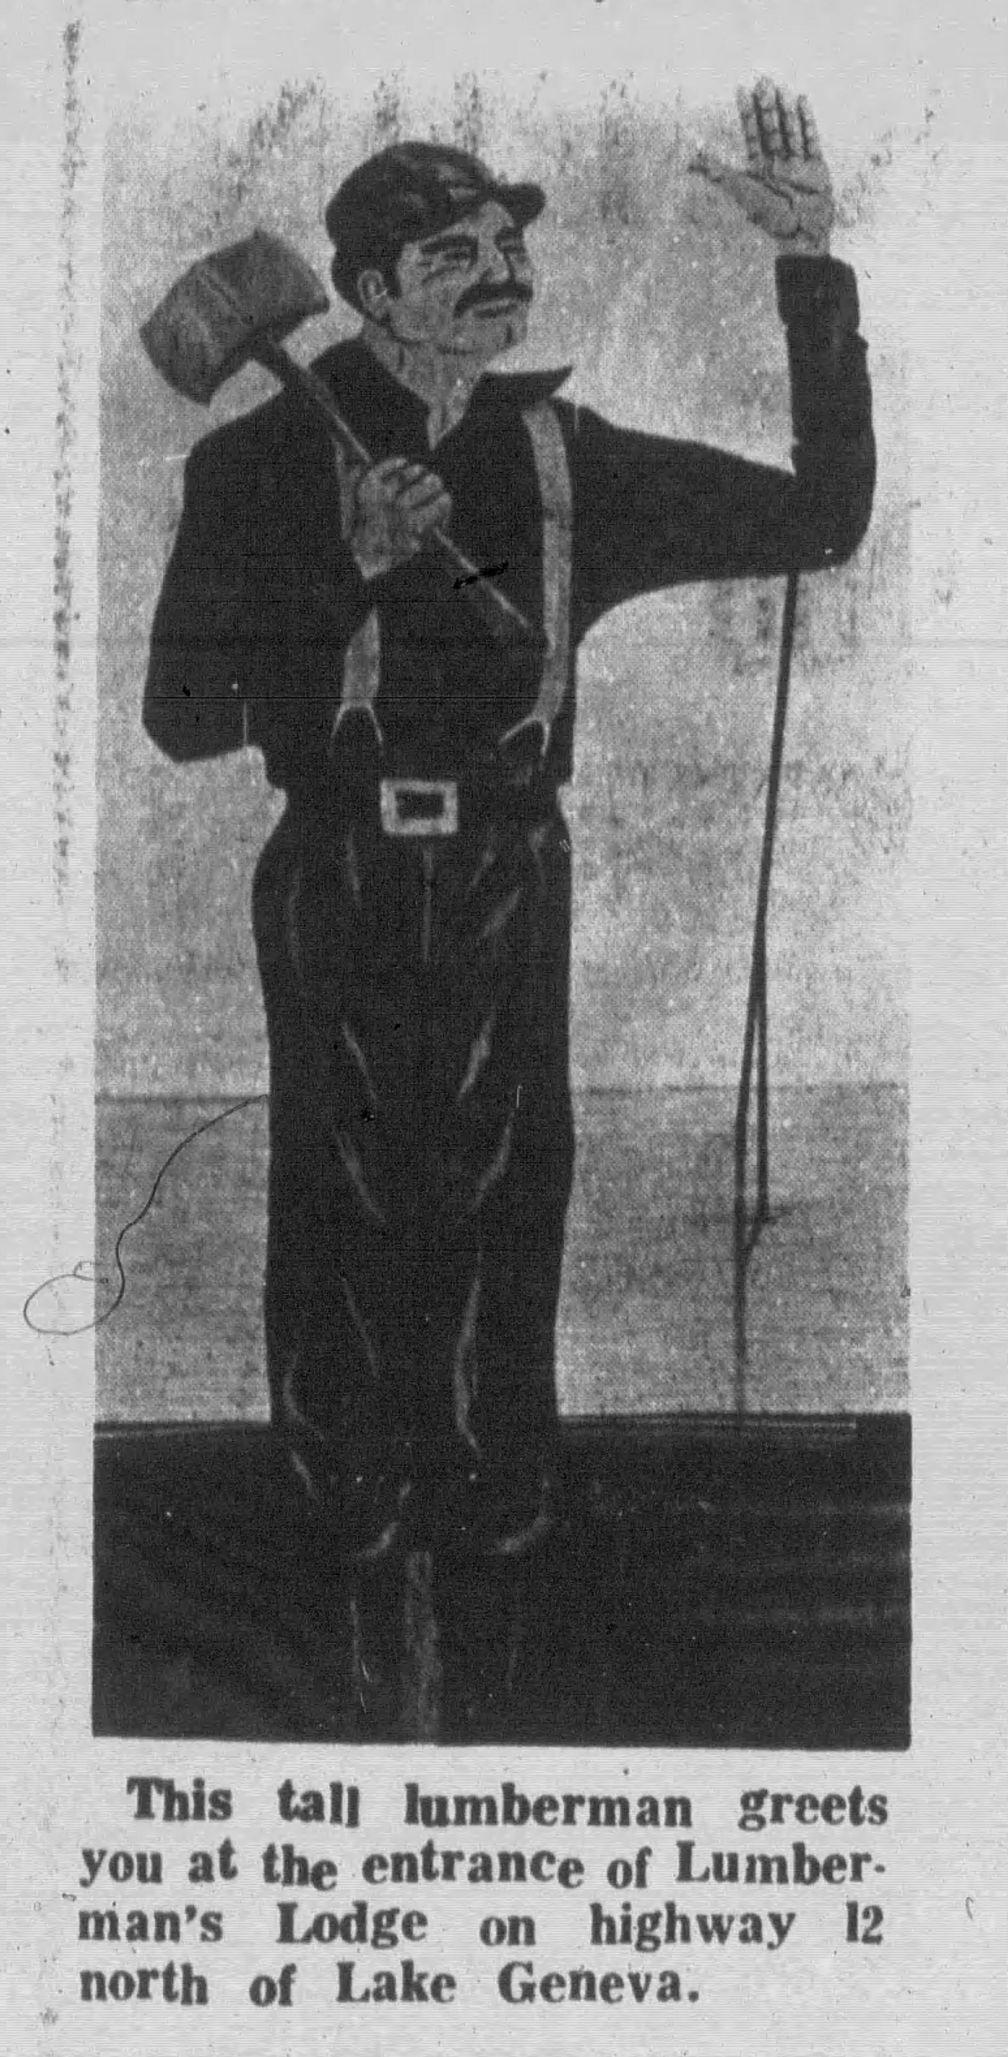 June 27, 1968 Regional News